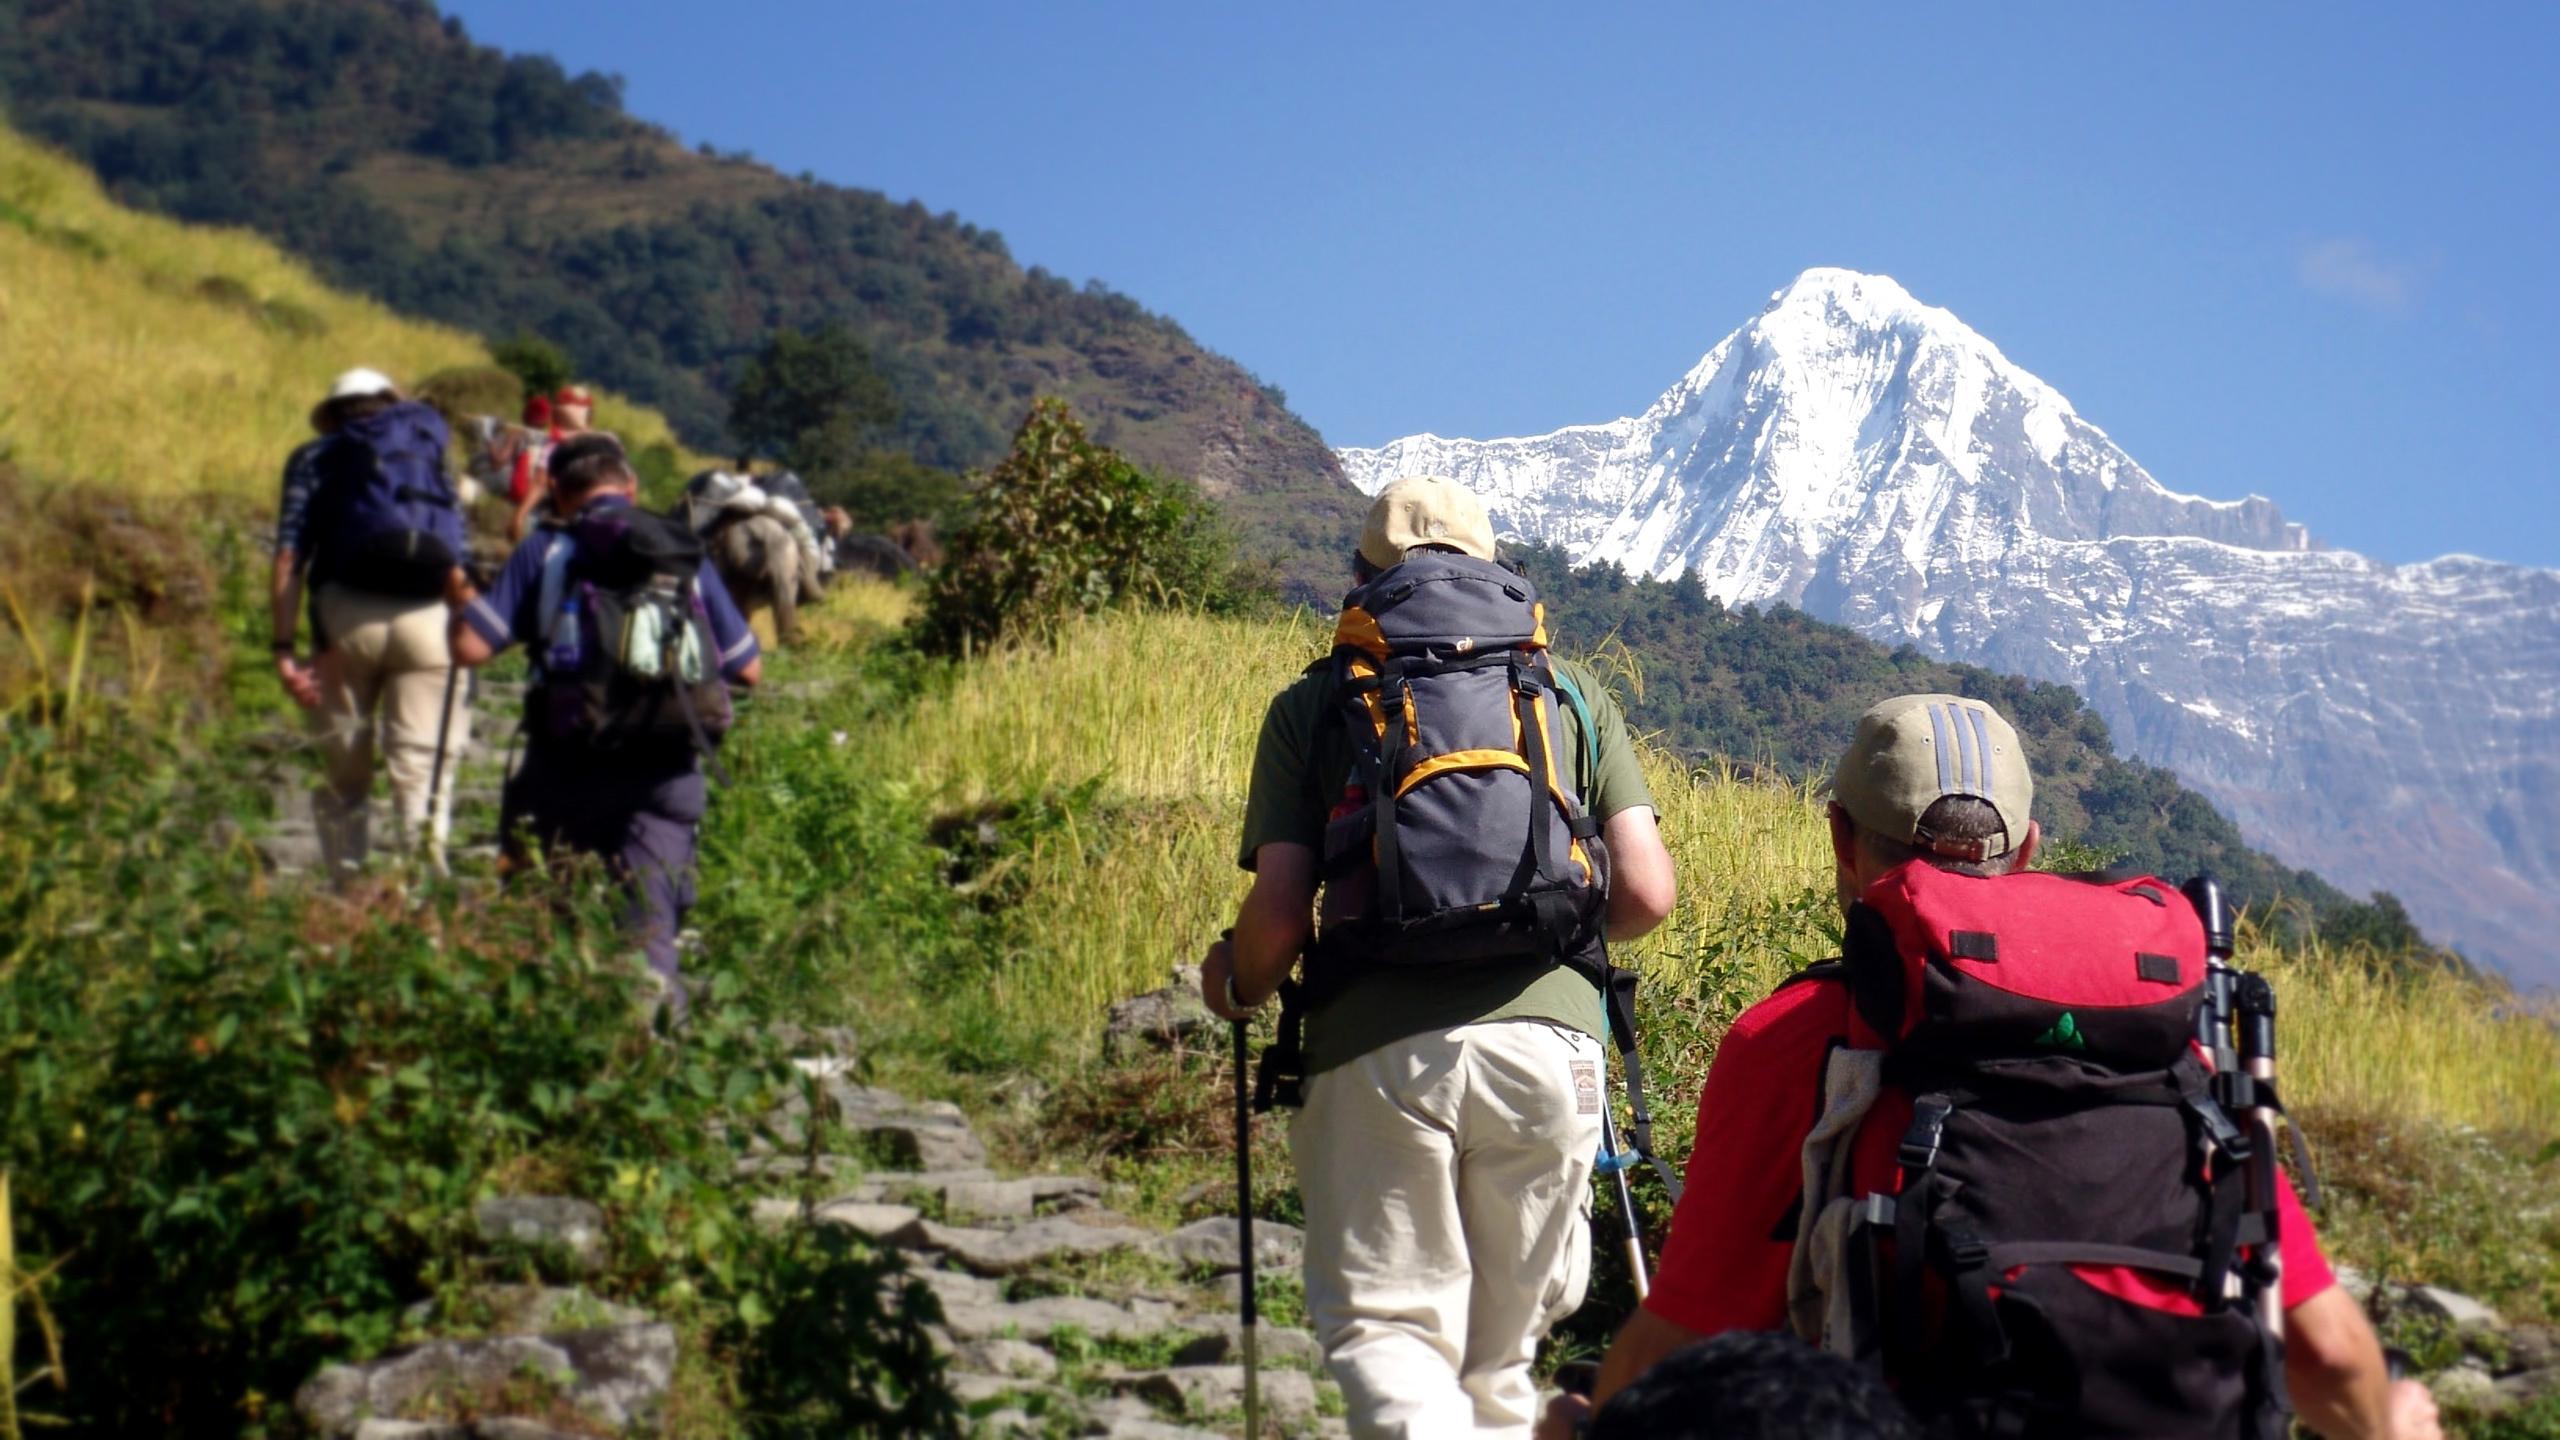 Asia Travel Advisory & Guide